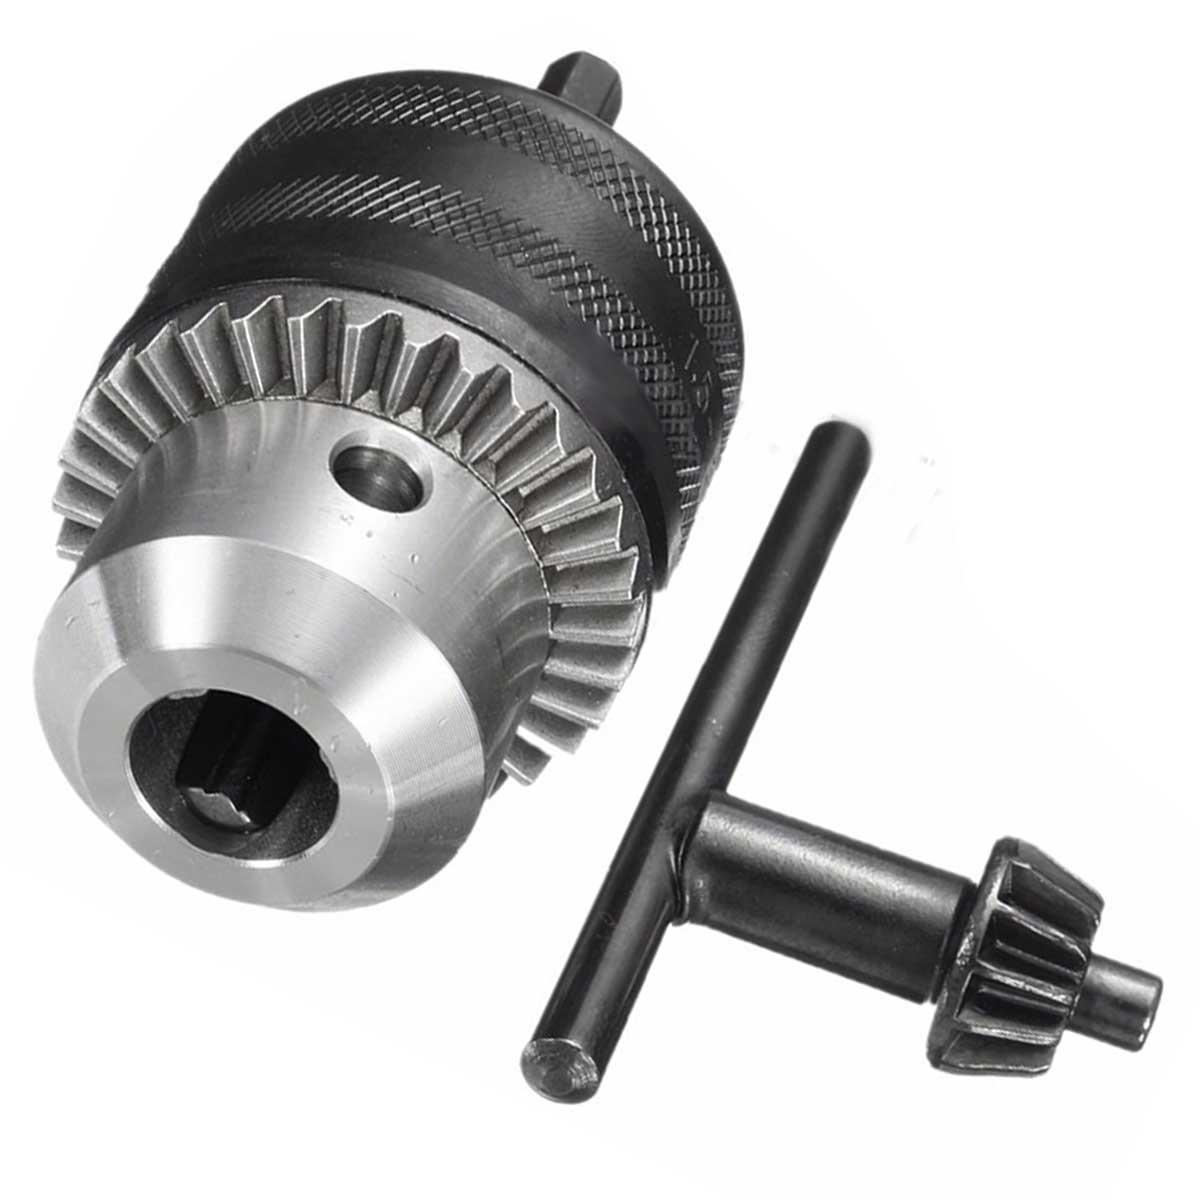 1pc Quick Change Drill Chuck Driver Converter 1.5-13mm + 1/2'' Hex Shank Key Adaptor For Power Tools  цены